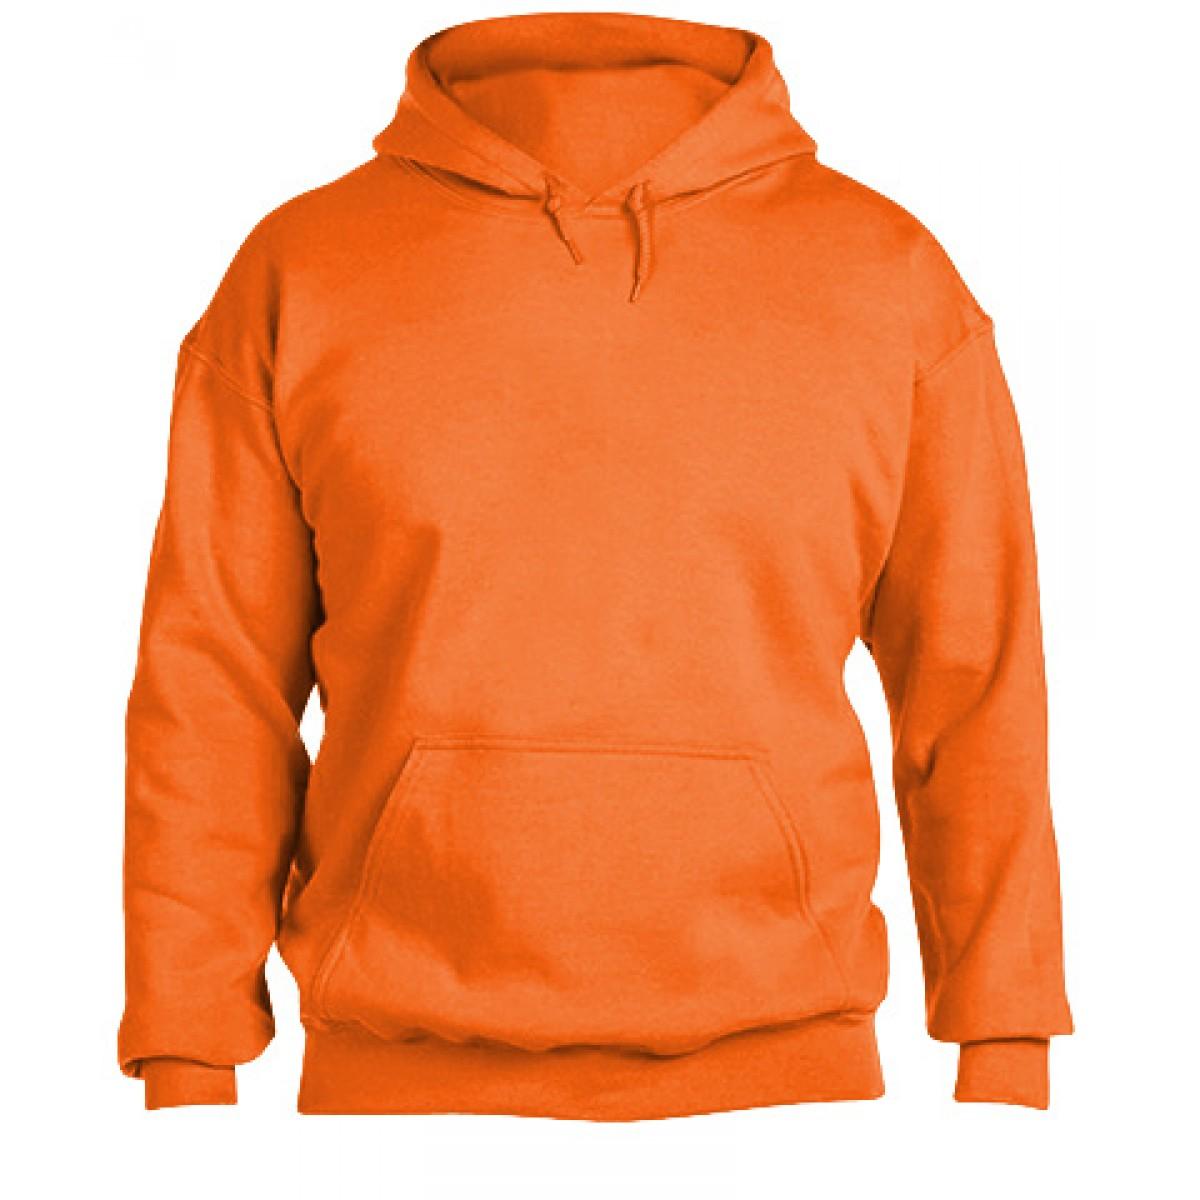 Hooded Sweatshirt  50/50 Heavy Blend-Safety Orange-YS